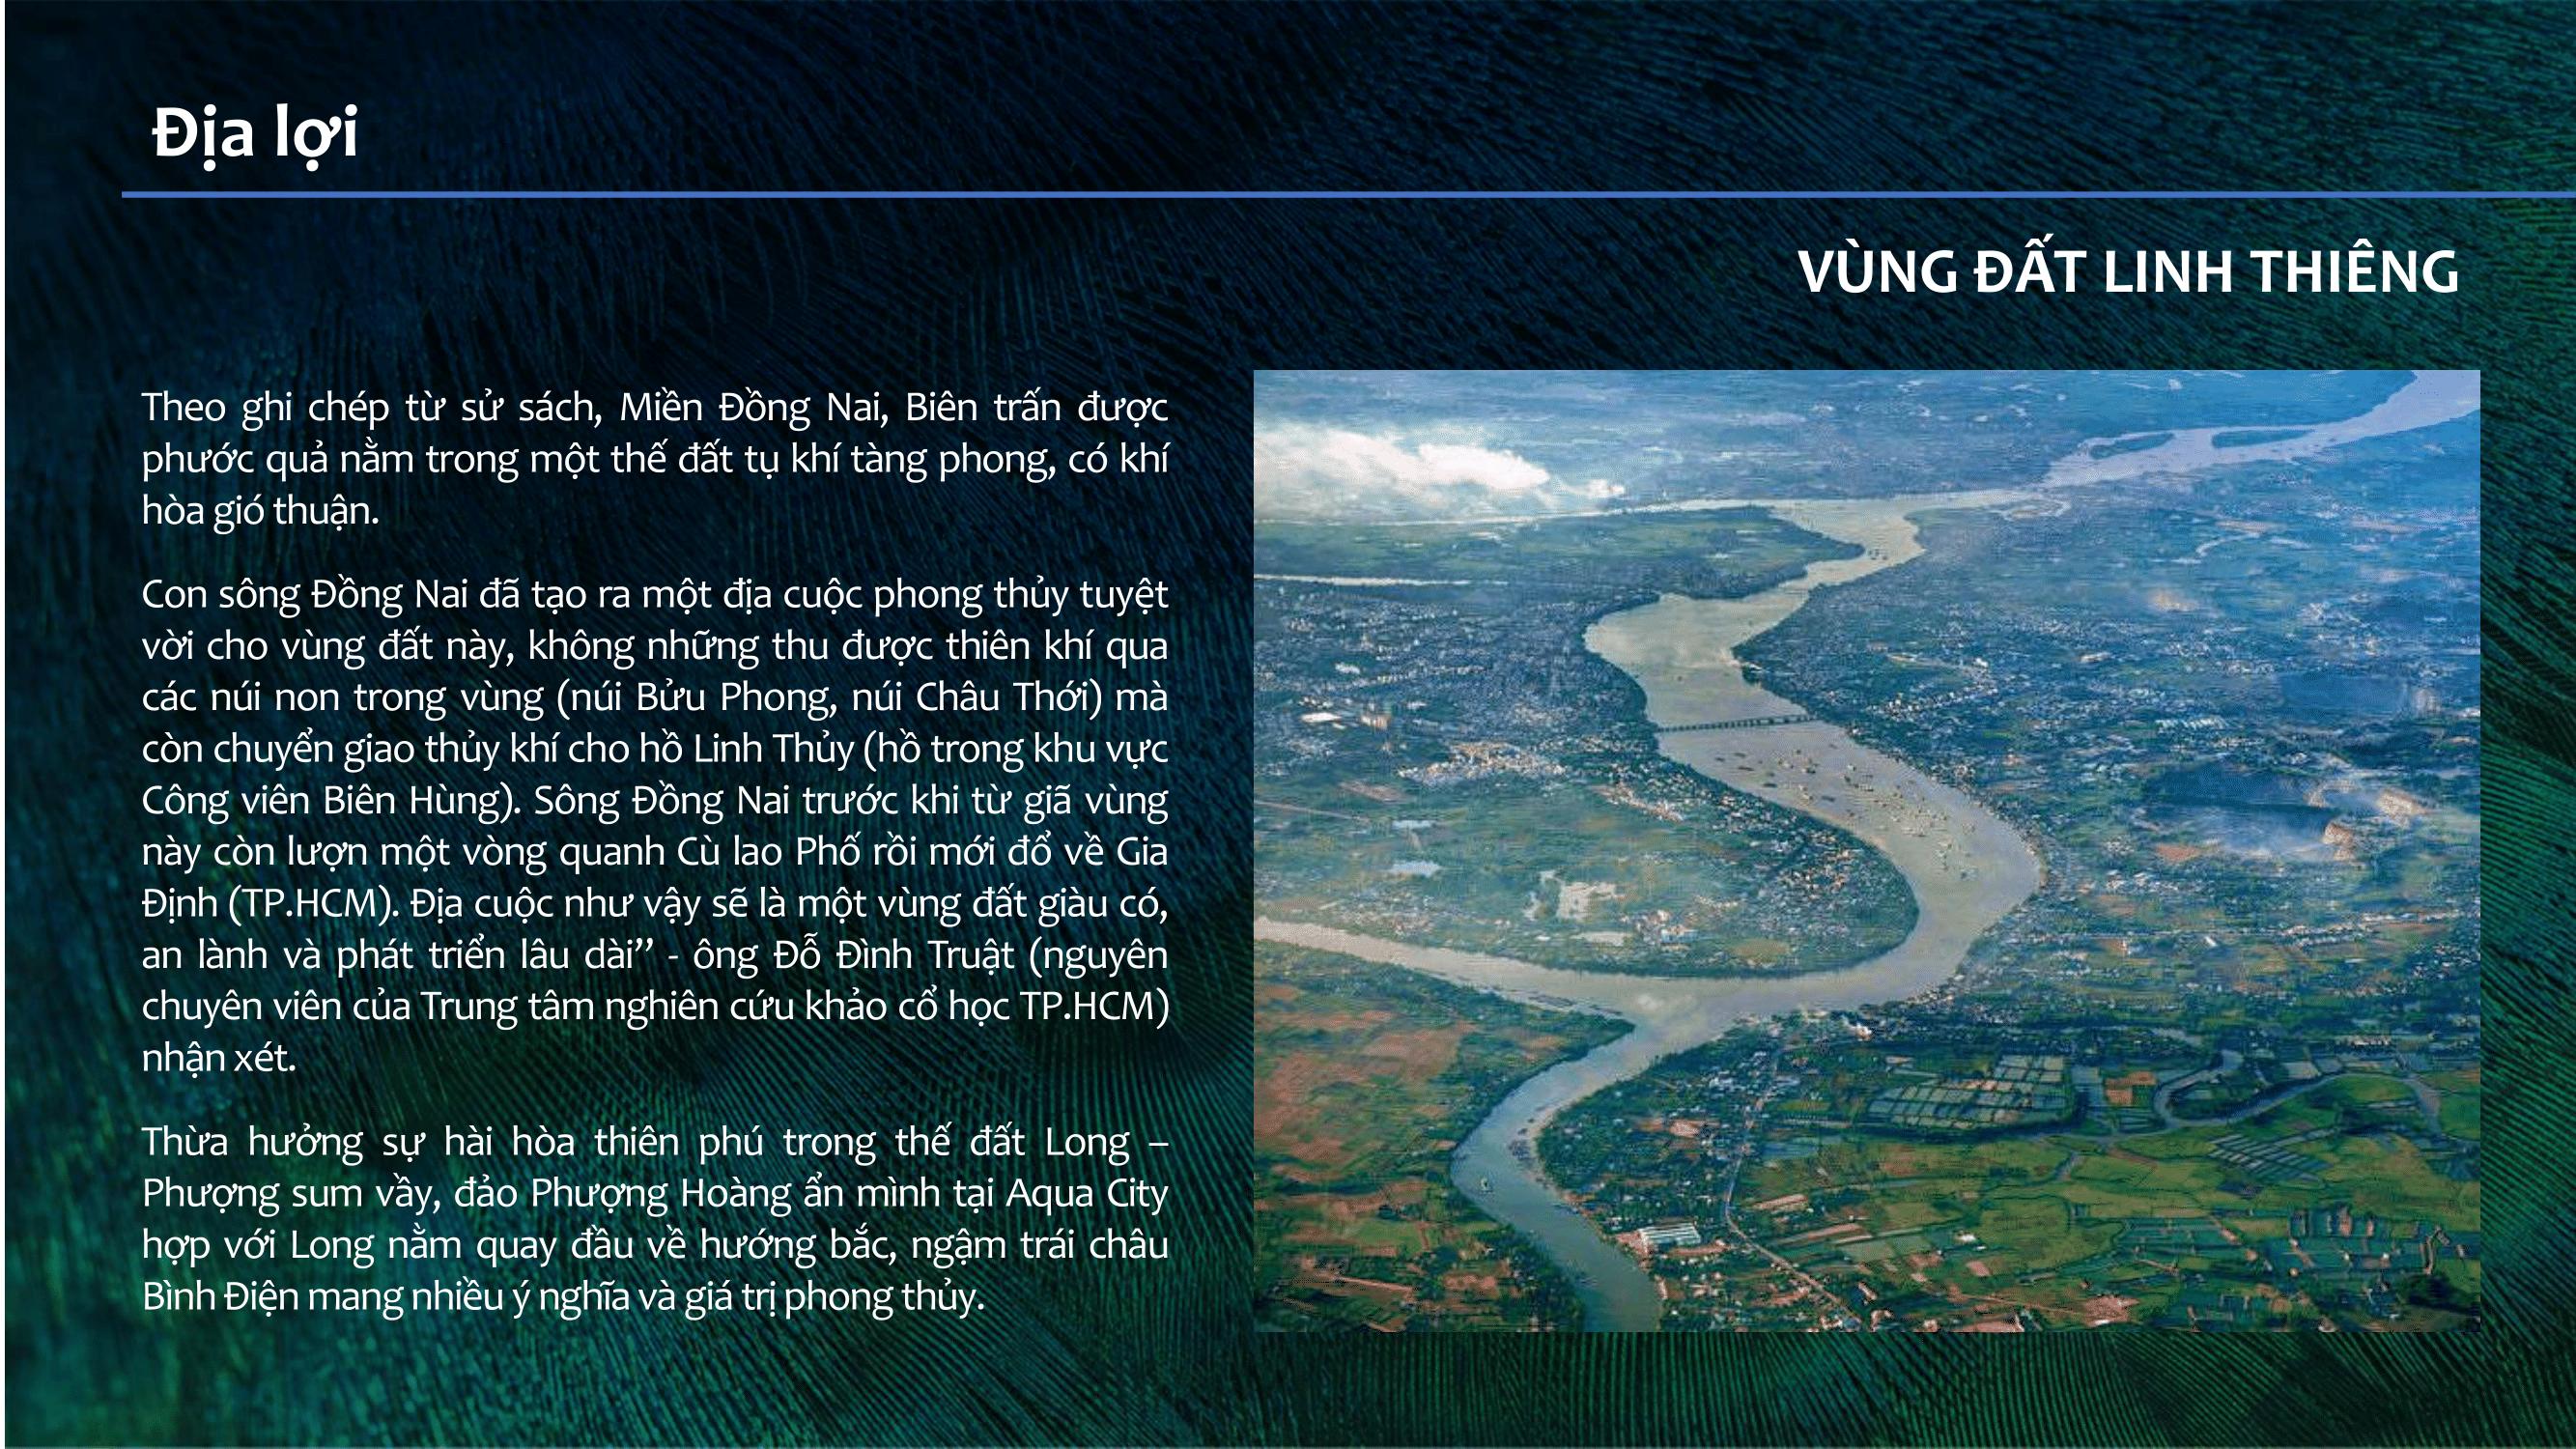 Aqua City Phan Khu Phoenix South Present 69